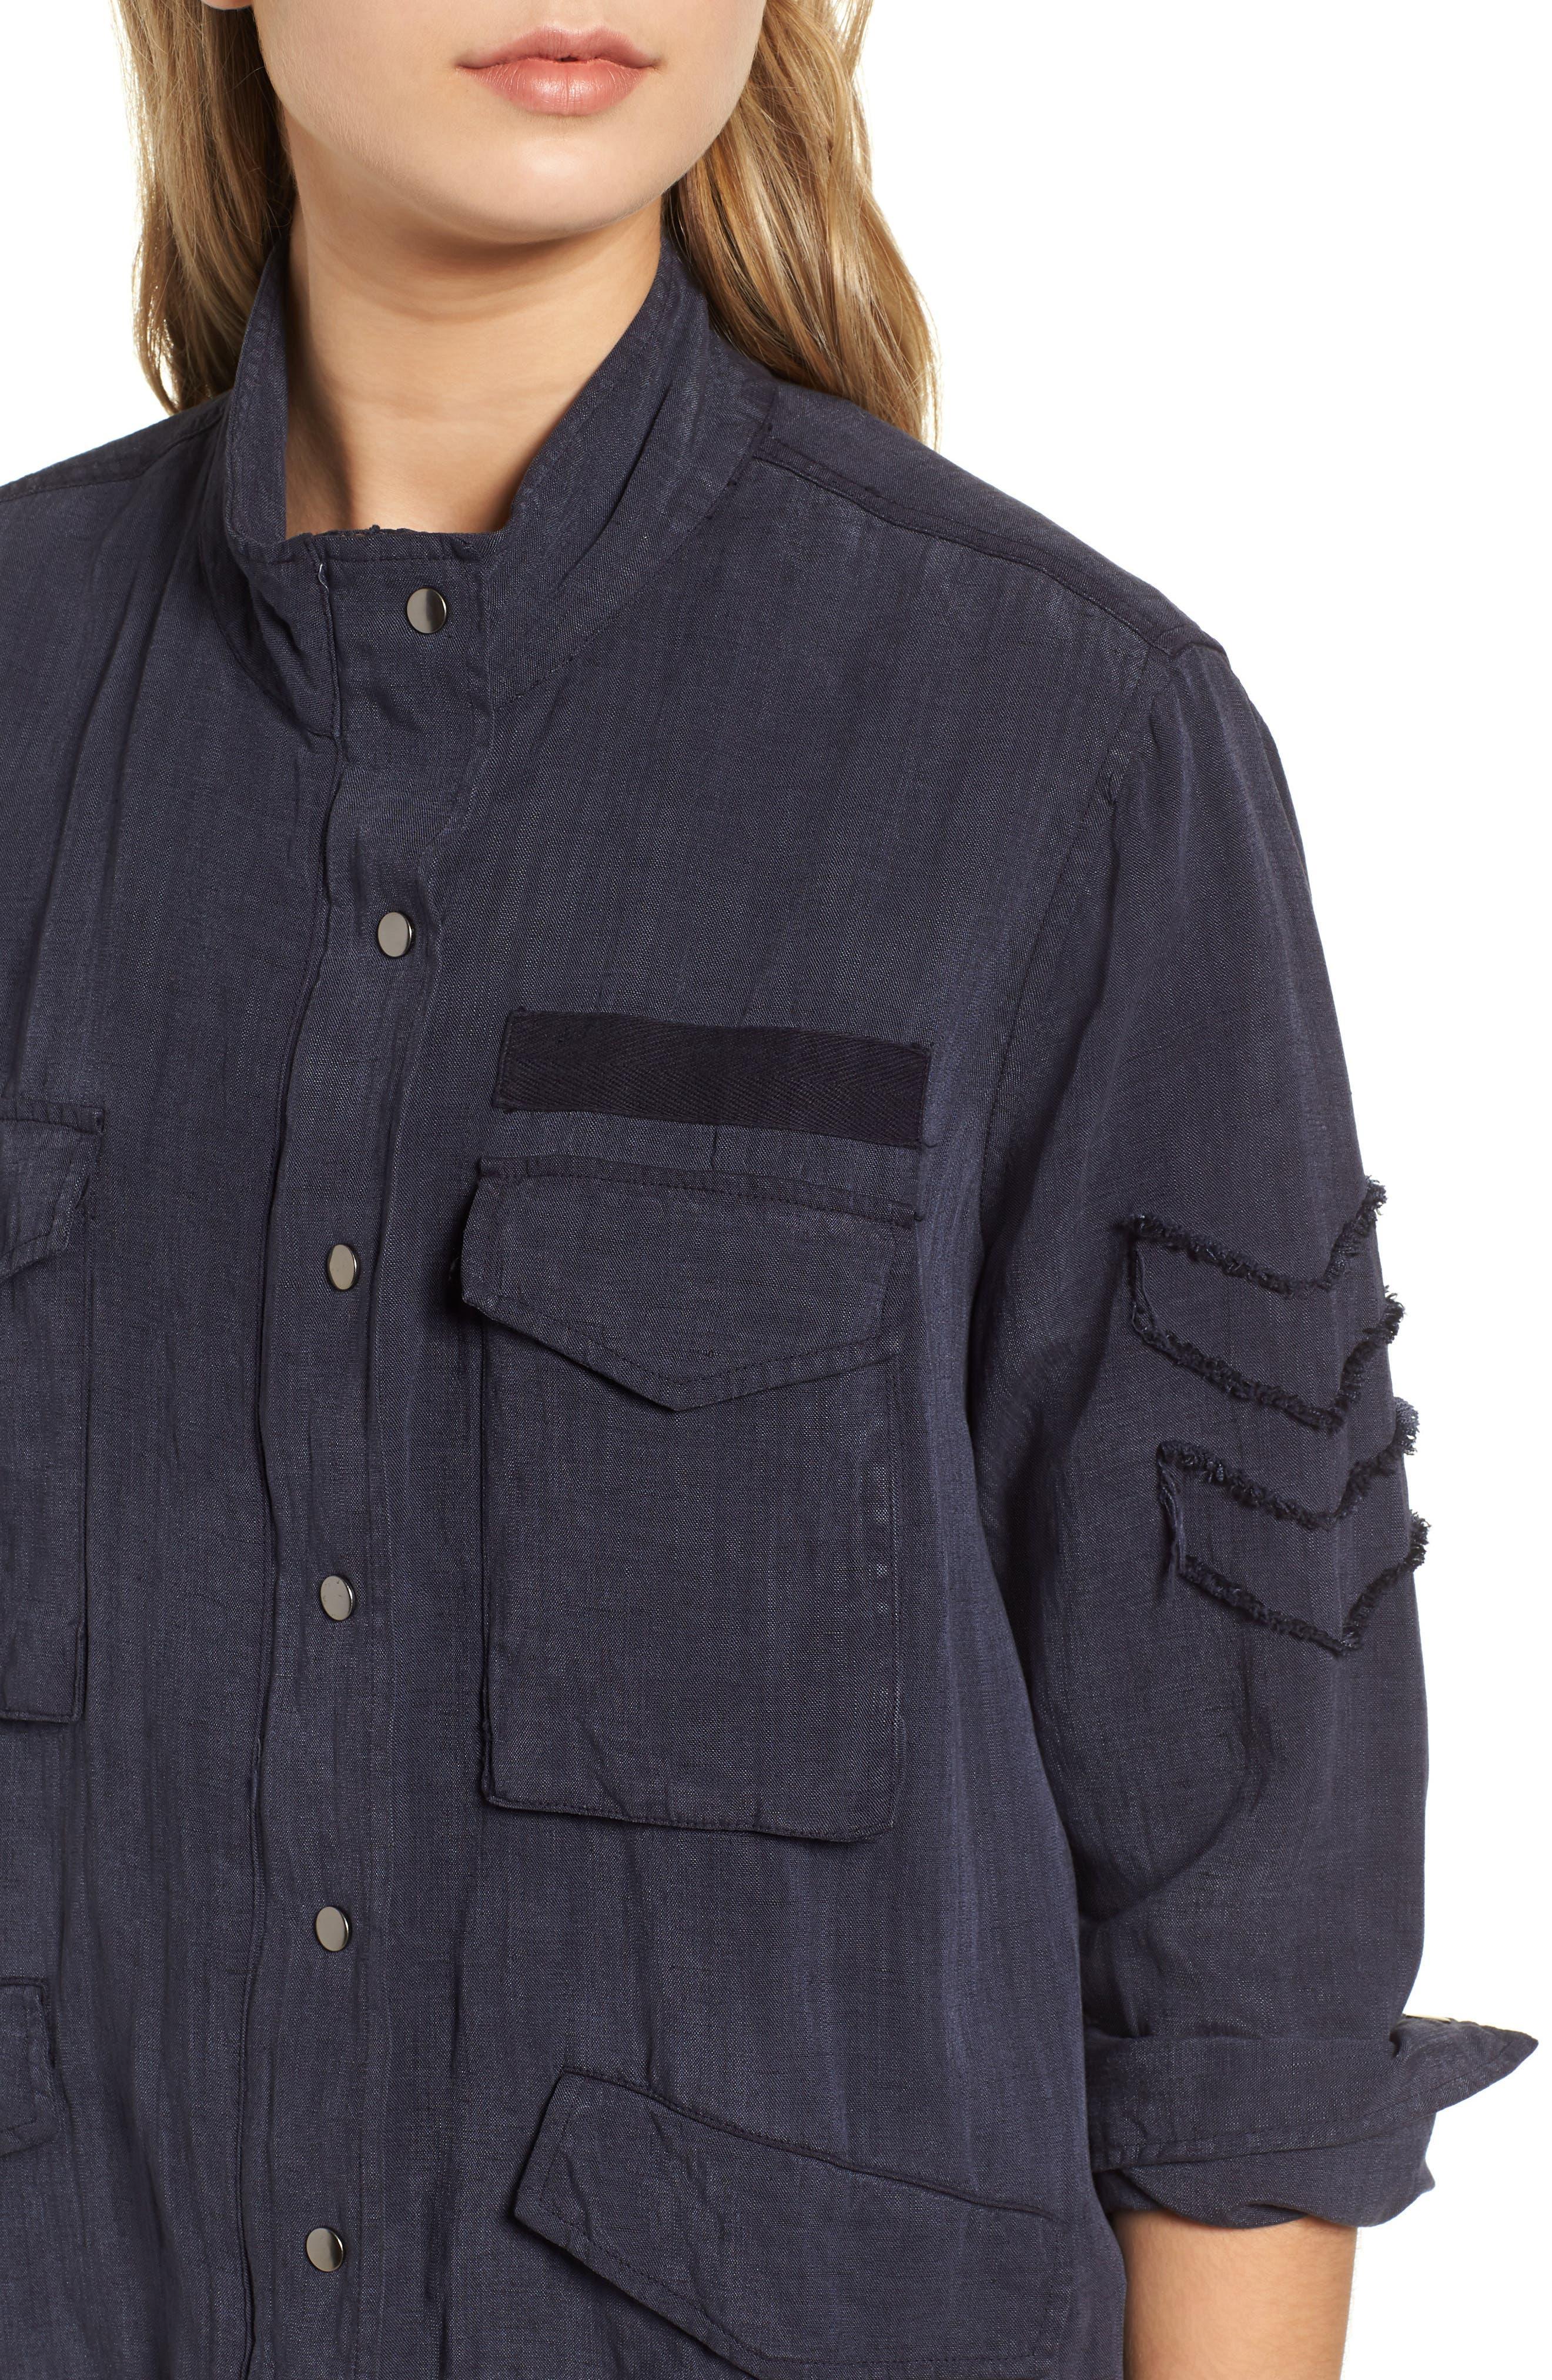 Halifax Drawstring Jacket,                             Alternate thumbnail 4, color,                             NAVY